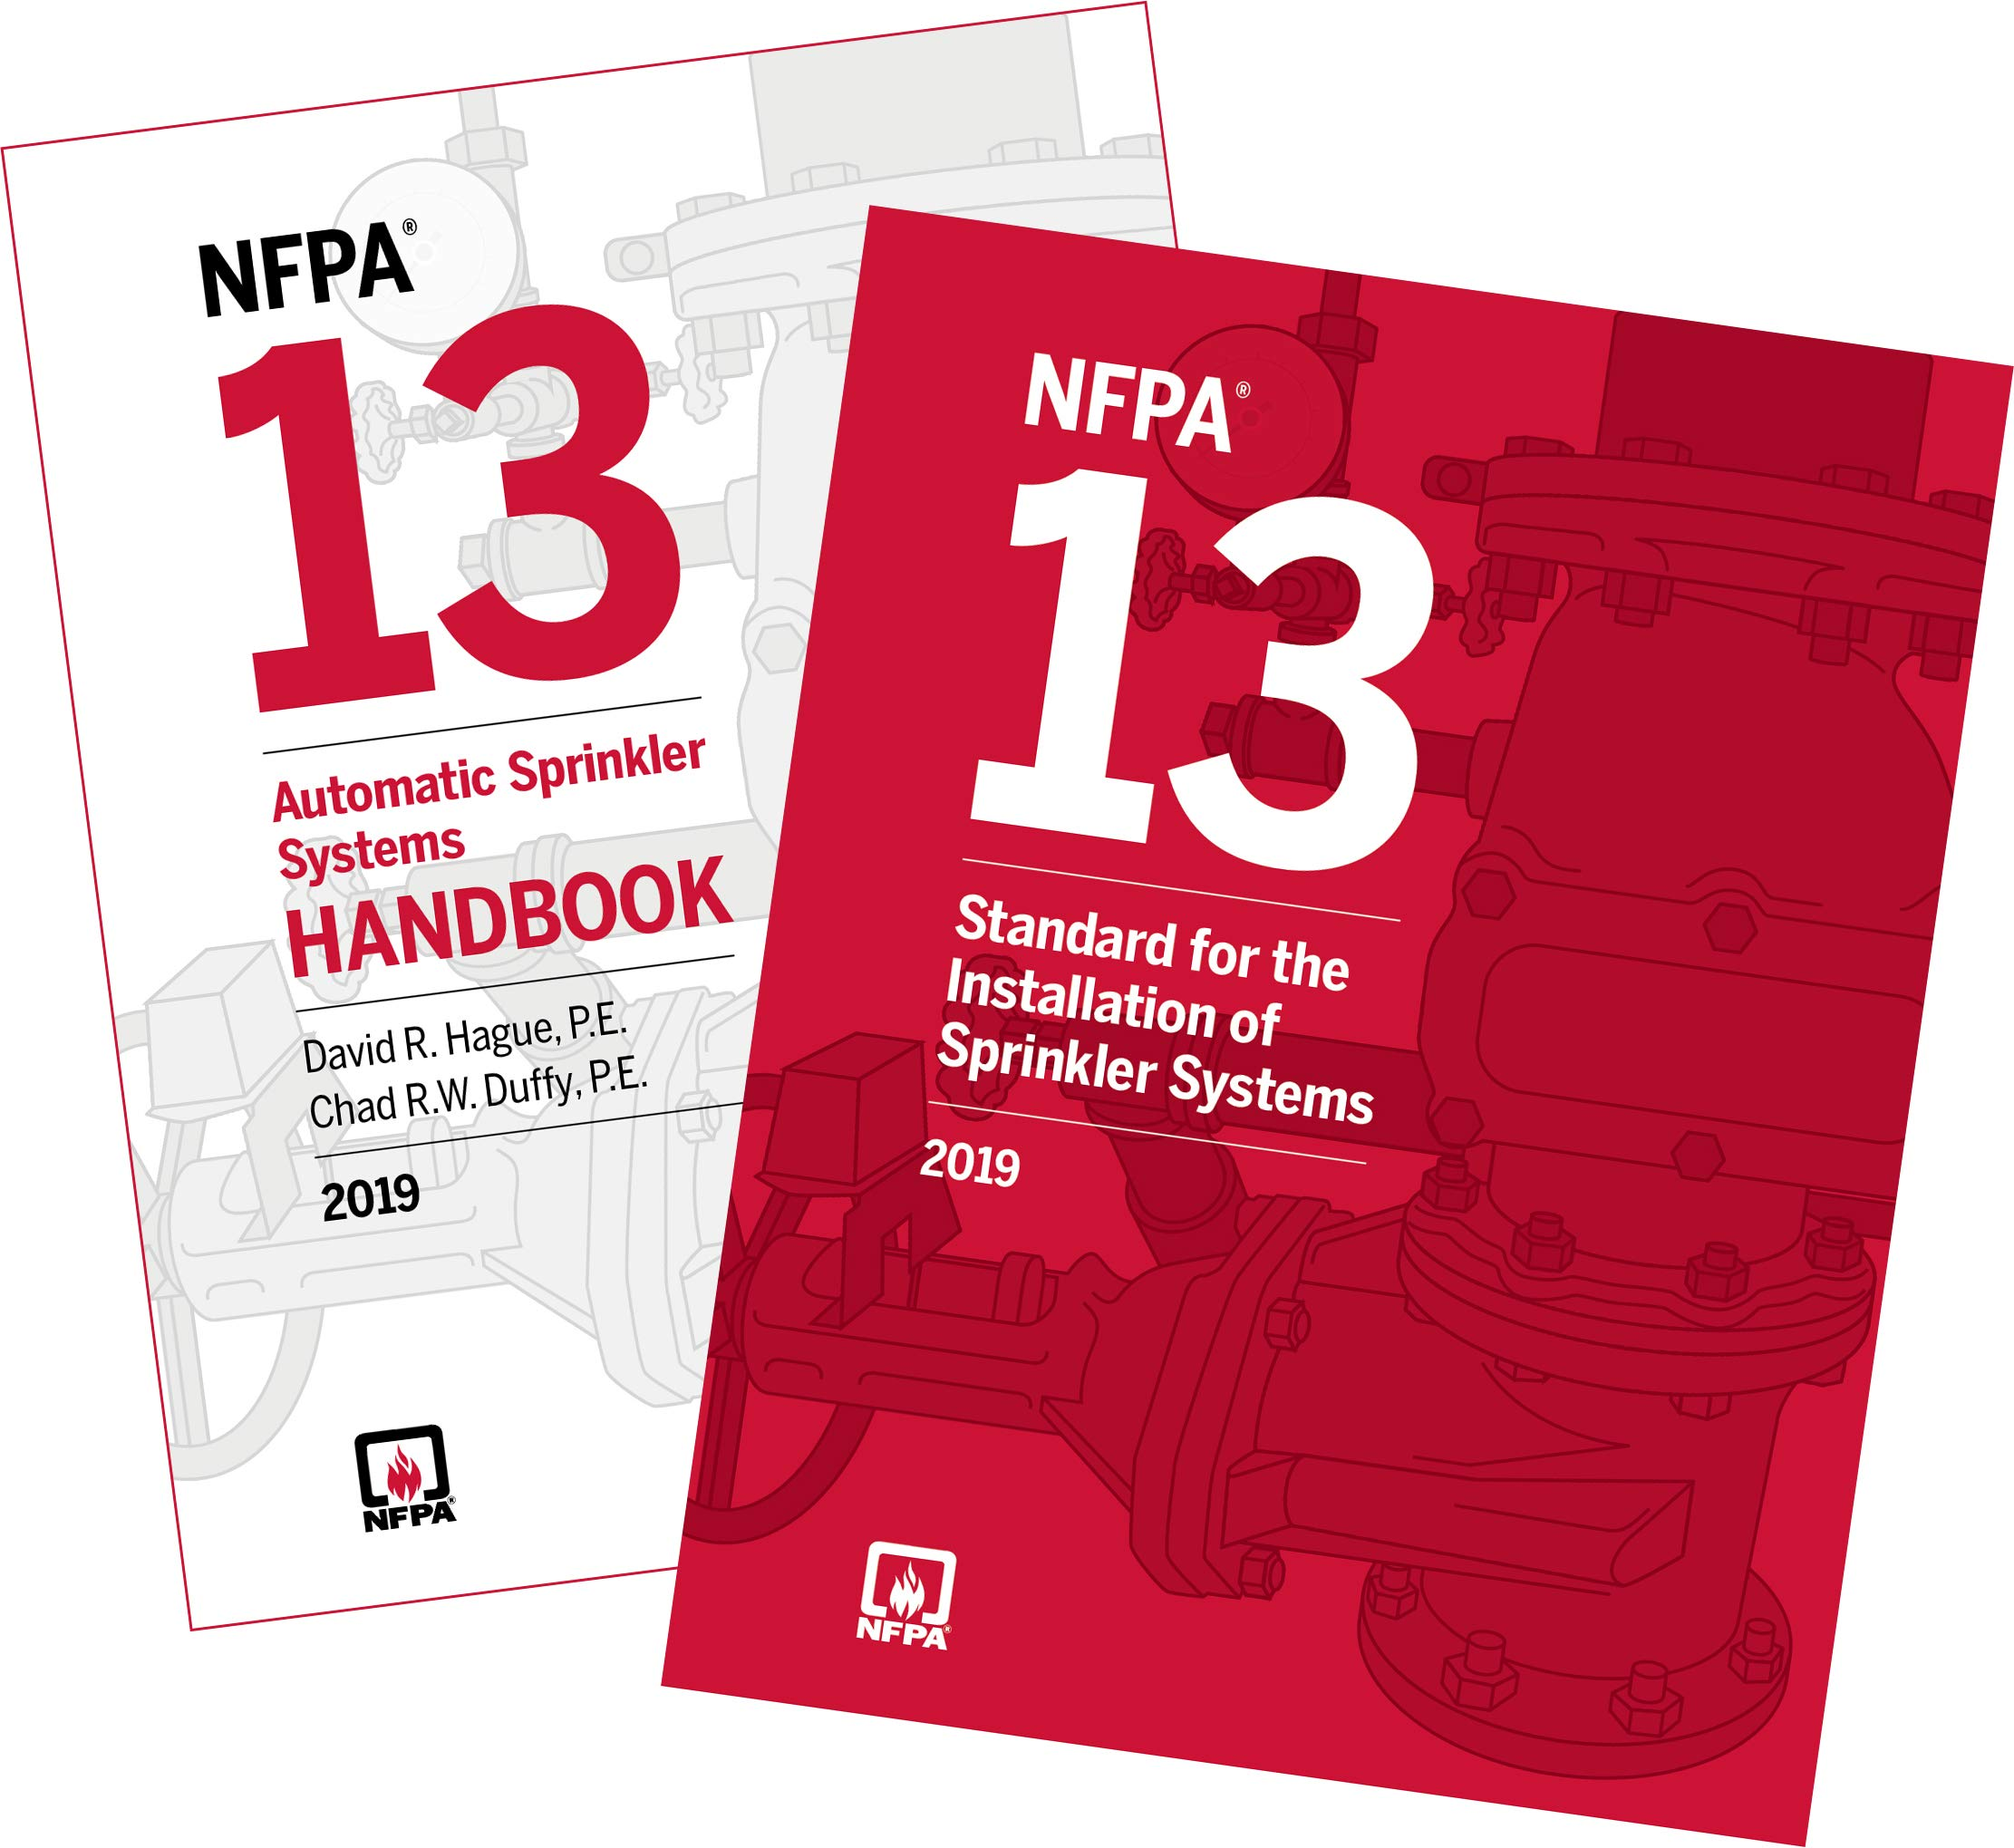 NFPA 13, Installation of Sprinkler Systems and Handbook Set